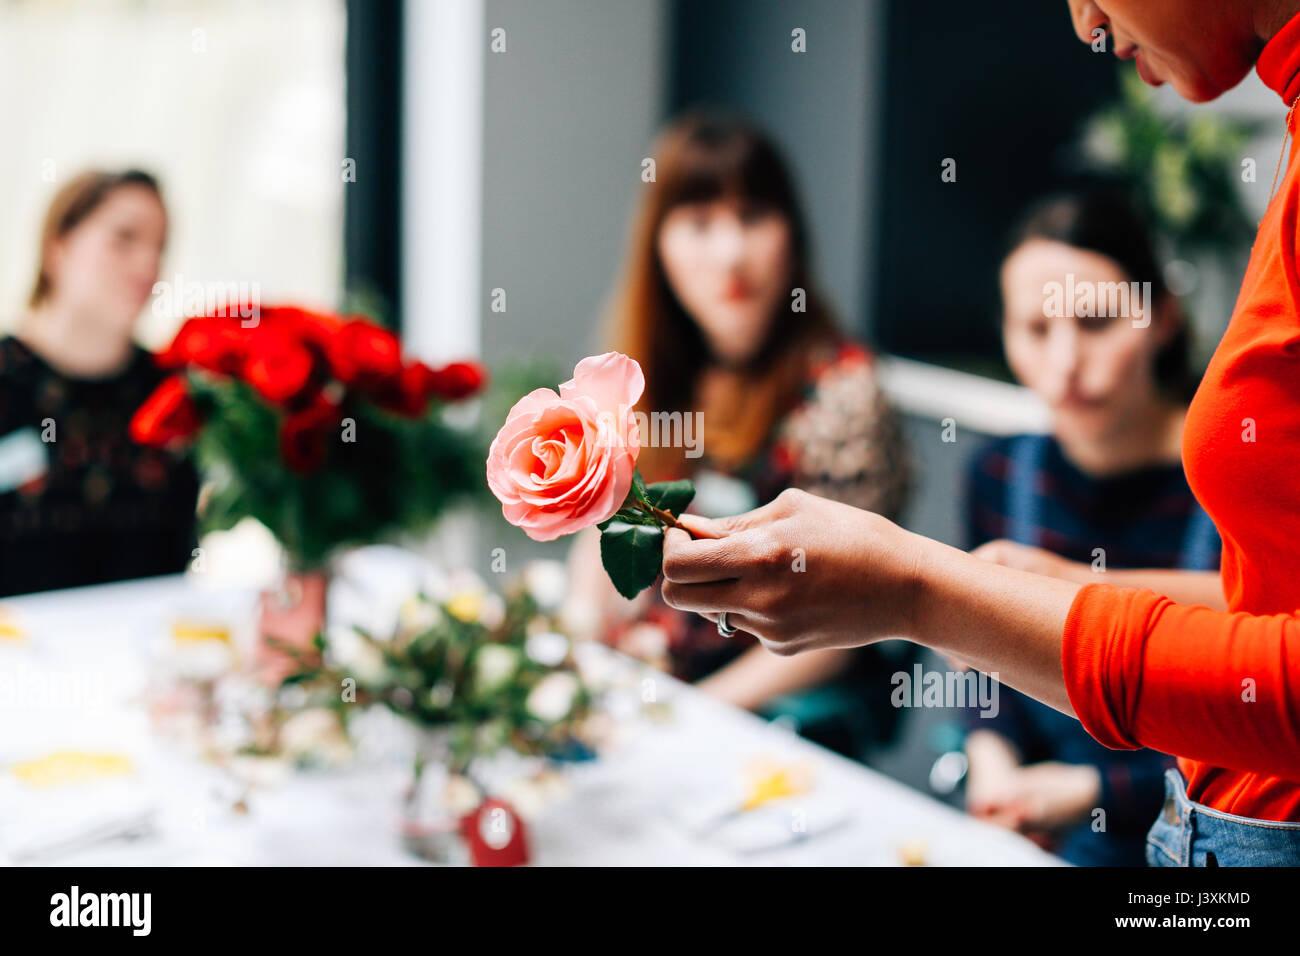 Florist showing rose to students in flower arranging workshop - Stock Image